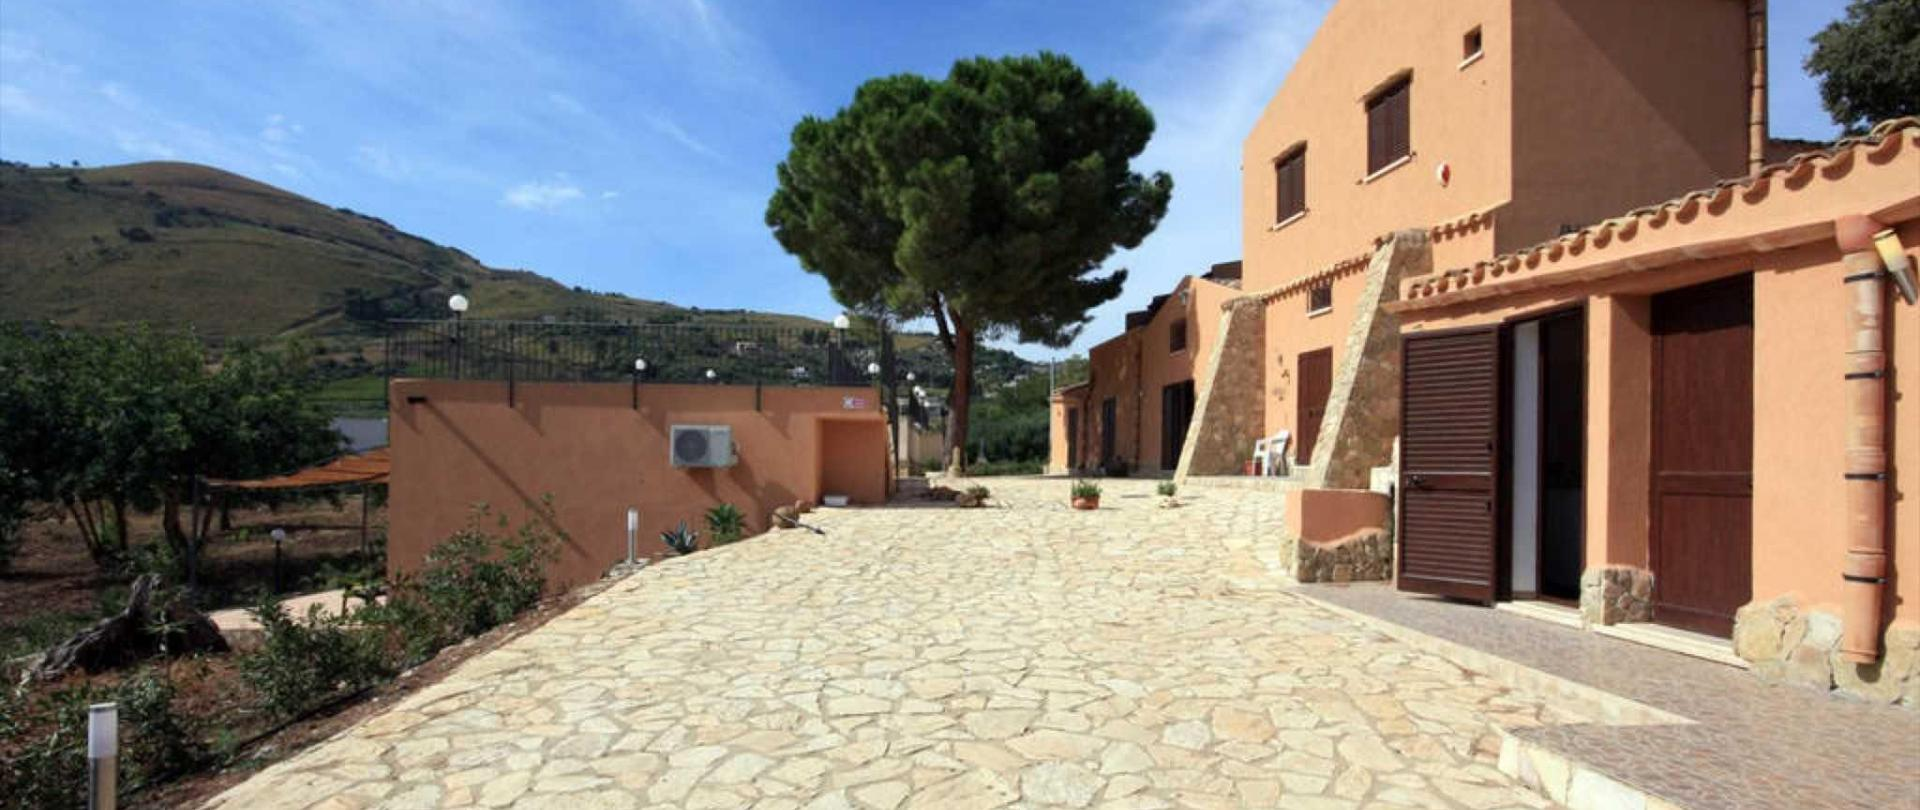 Le Terrazze su Fraginesi - La struttura